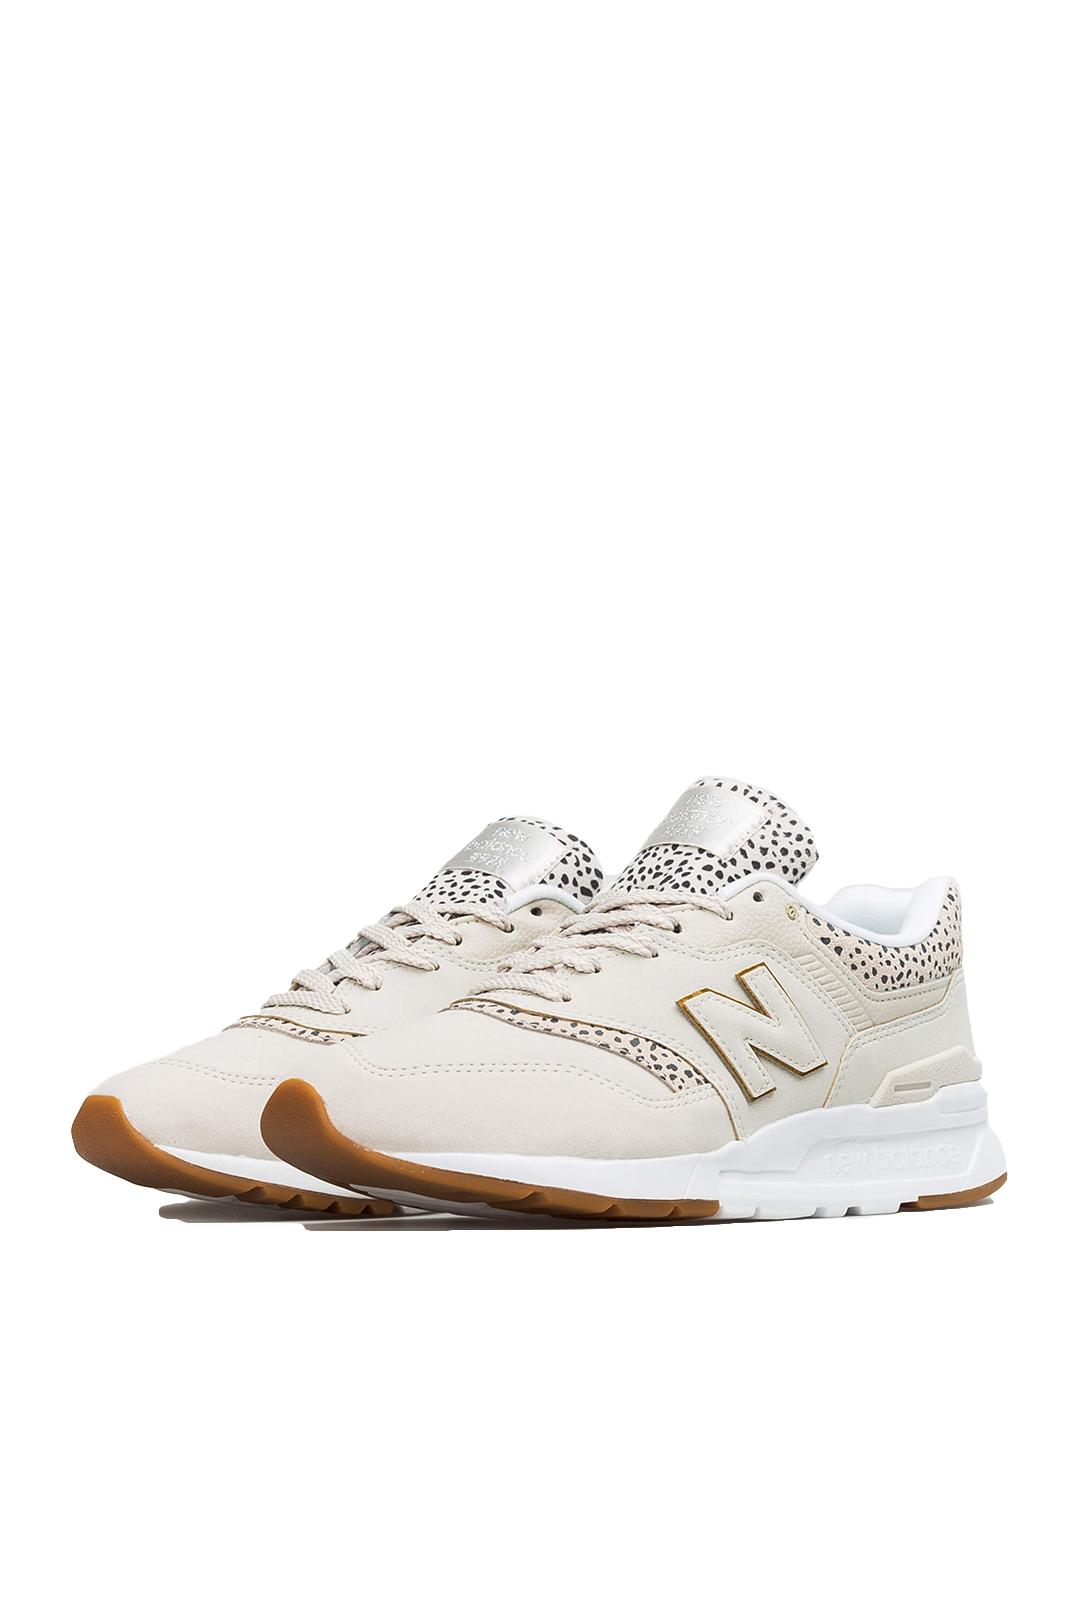 Baskets / Sneakers  New balance CW997HCH HCH